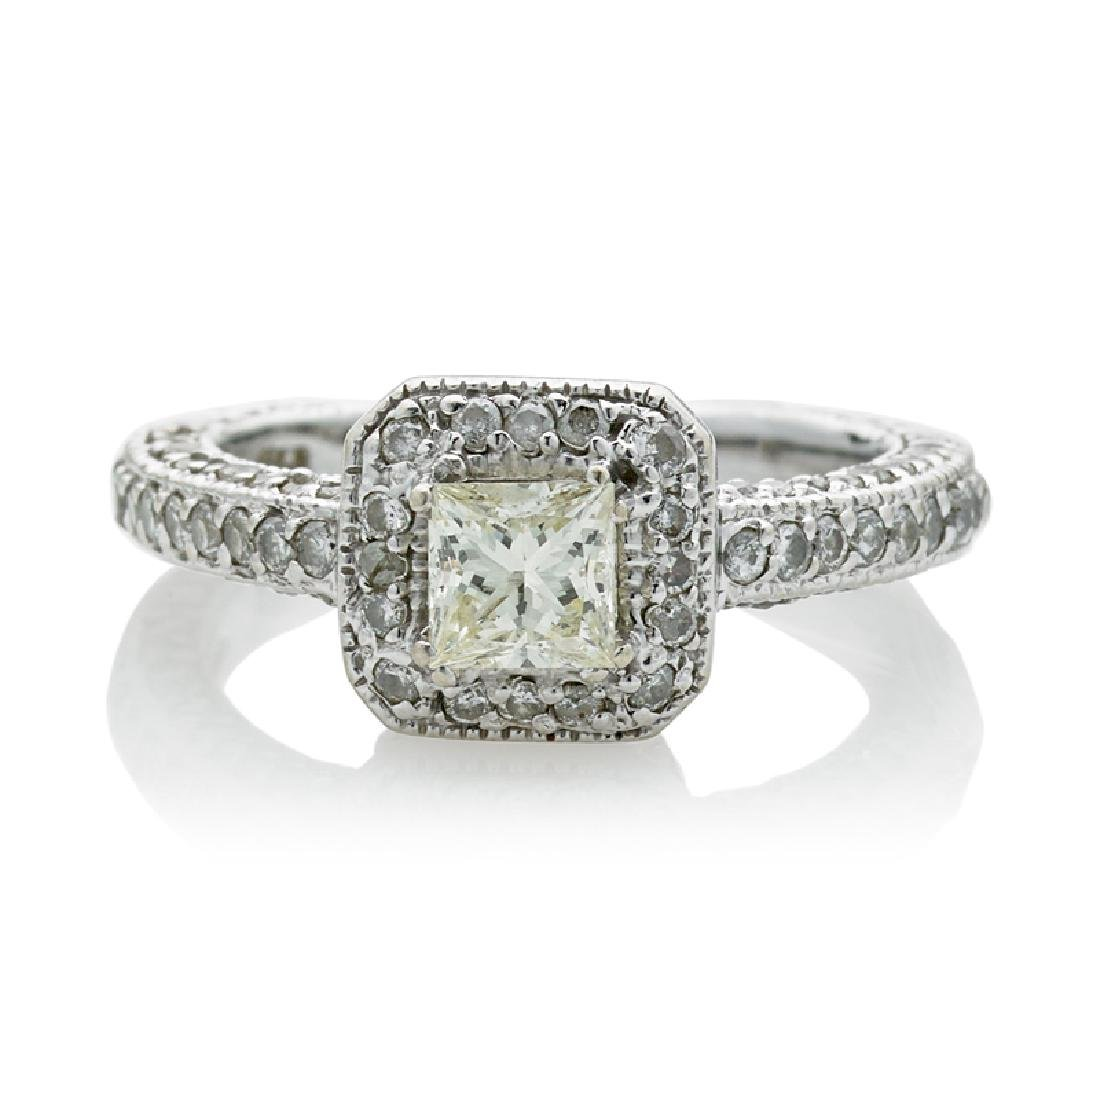 DIAMOND & WHITE GOLD RING